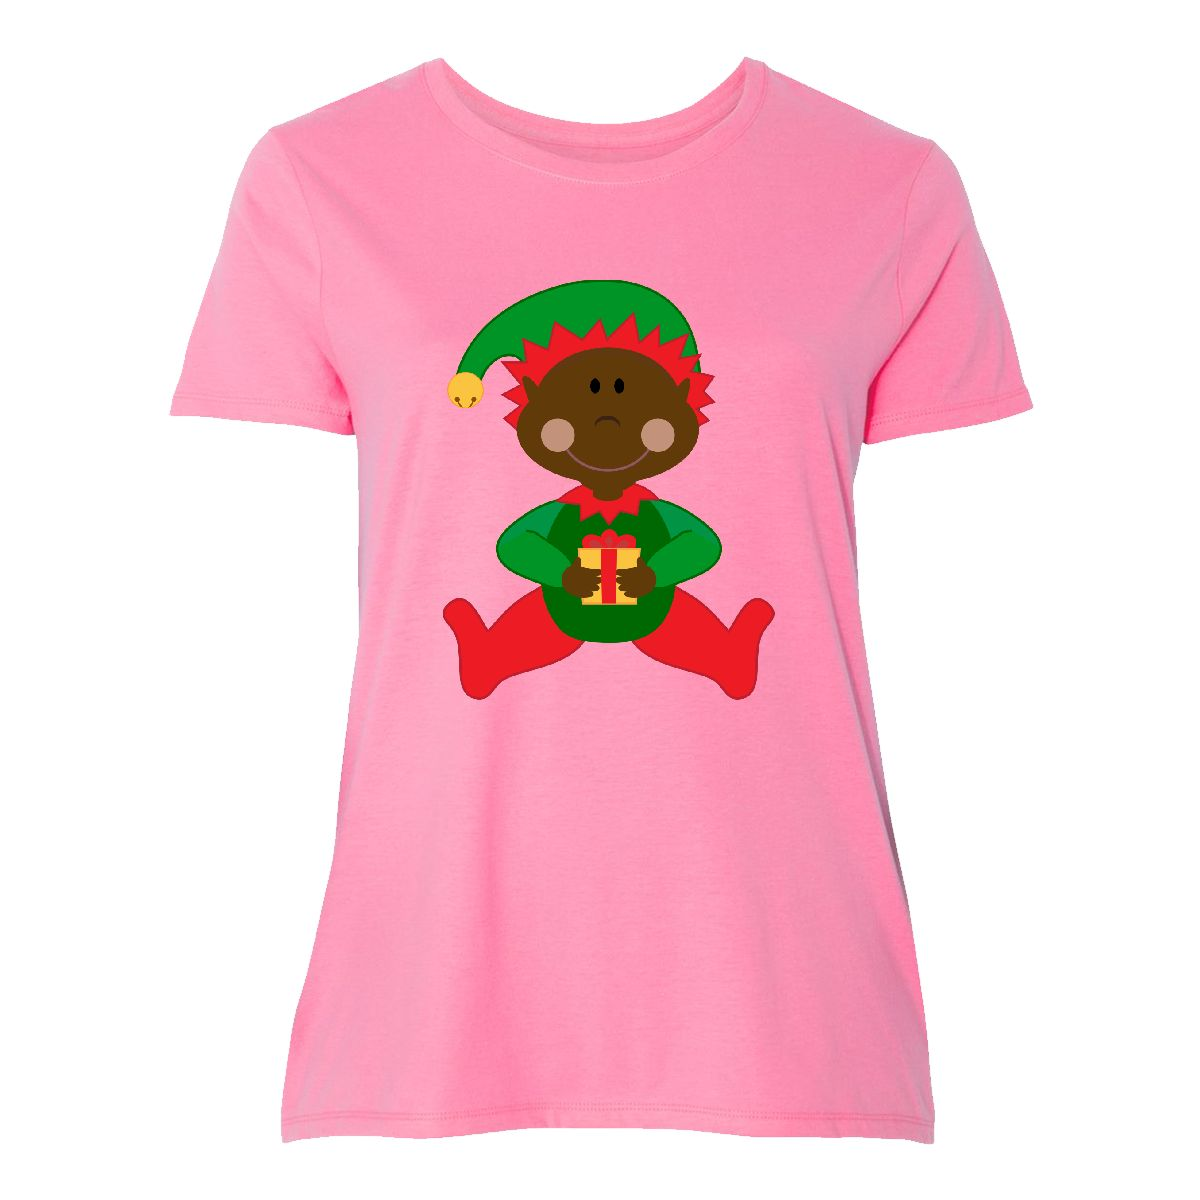 7622e5236 Inktastic Christmas Elf Ethnic Women's Plus Size T-Shirt Holiday ...